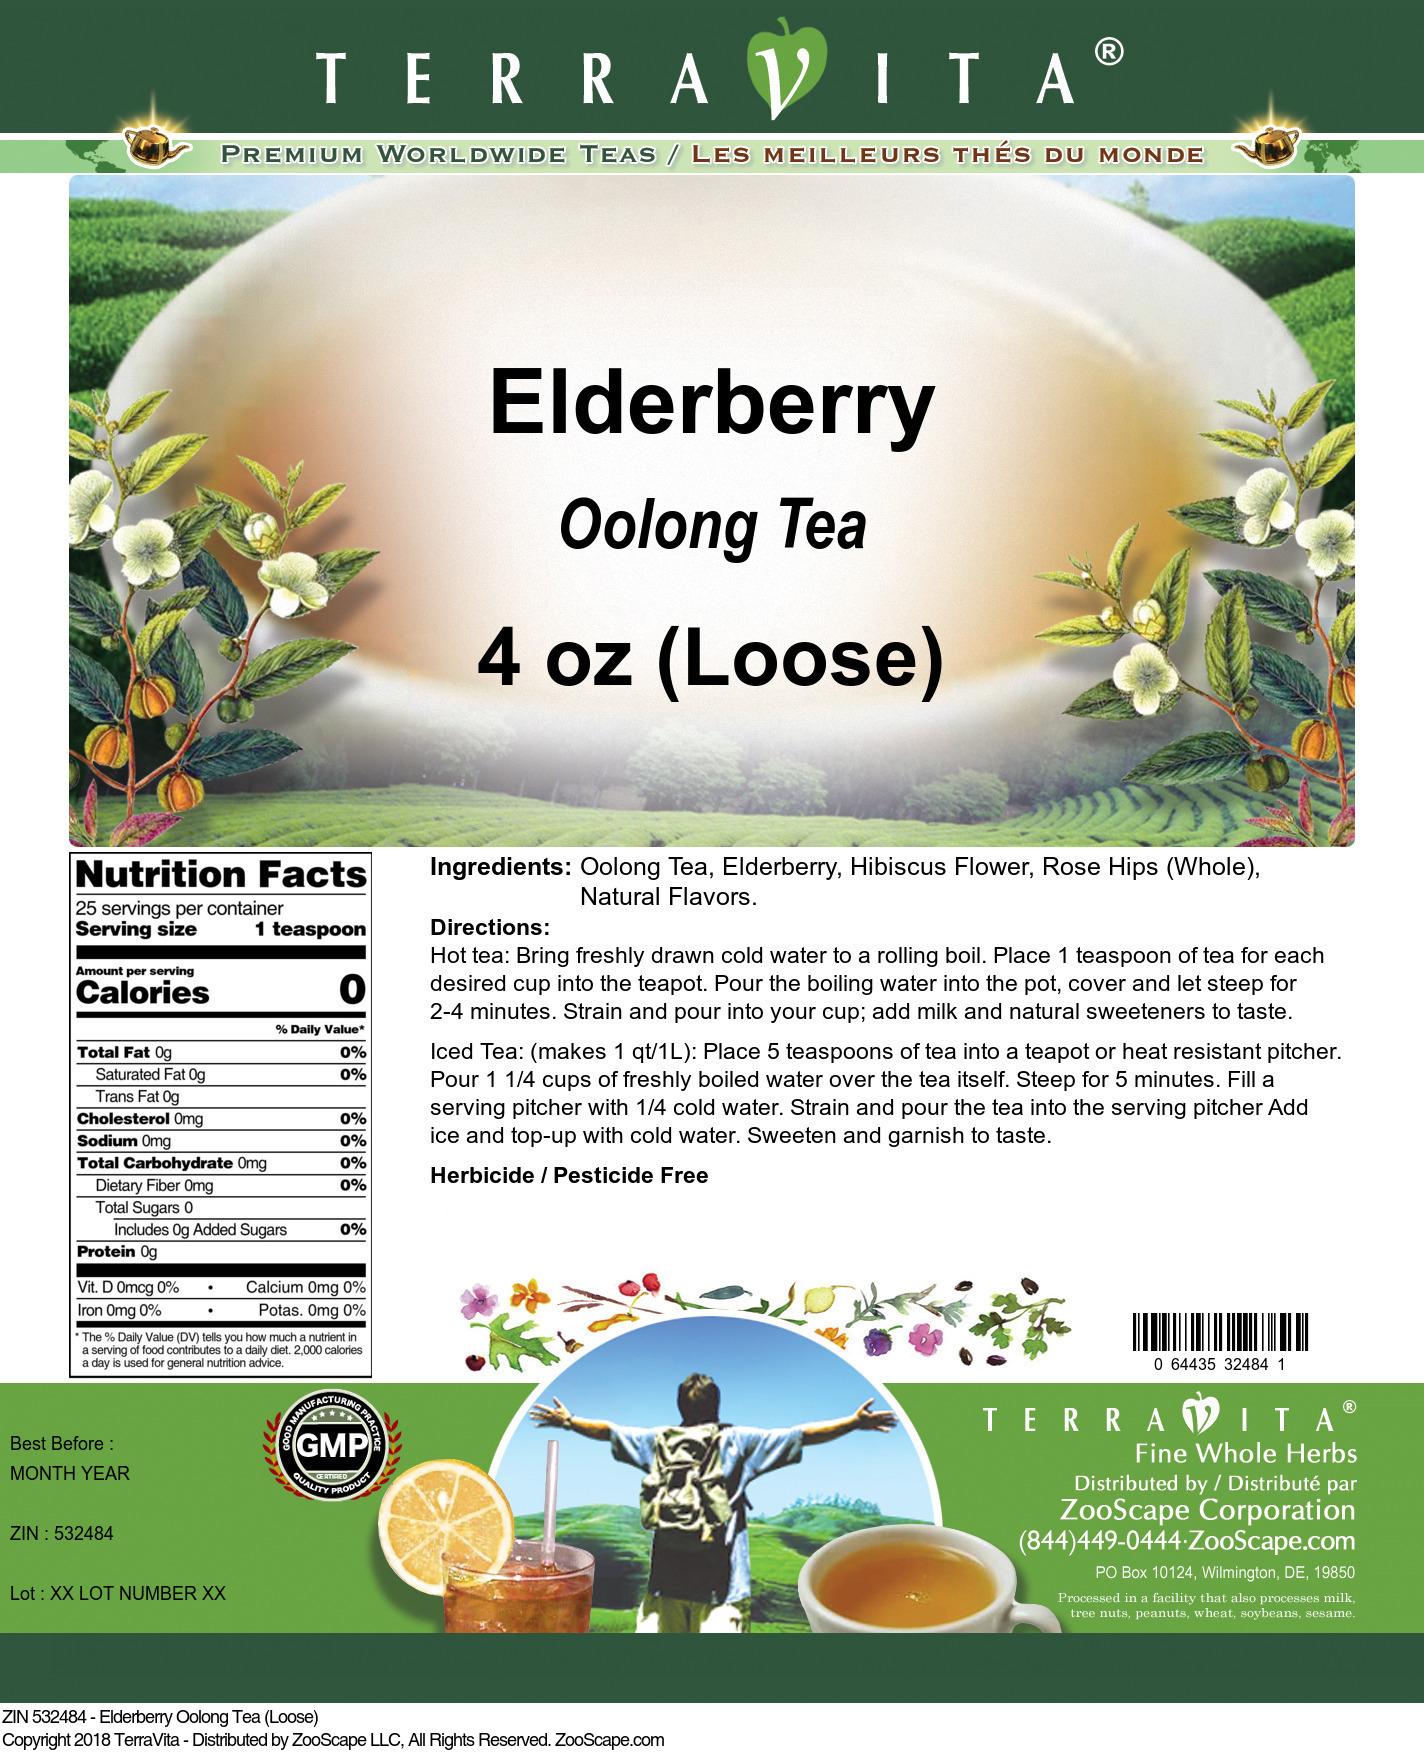 Elderberry Oolong Tea (Loose)